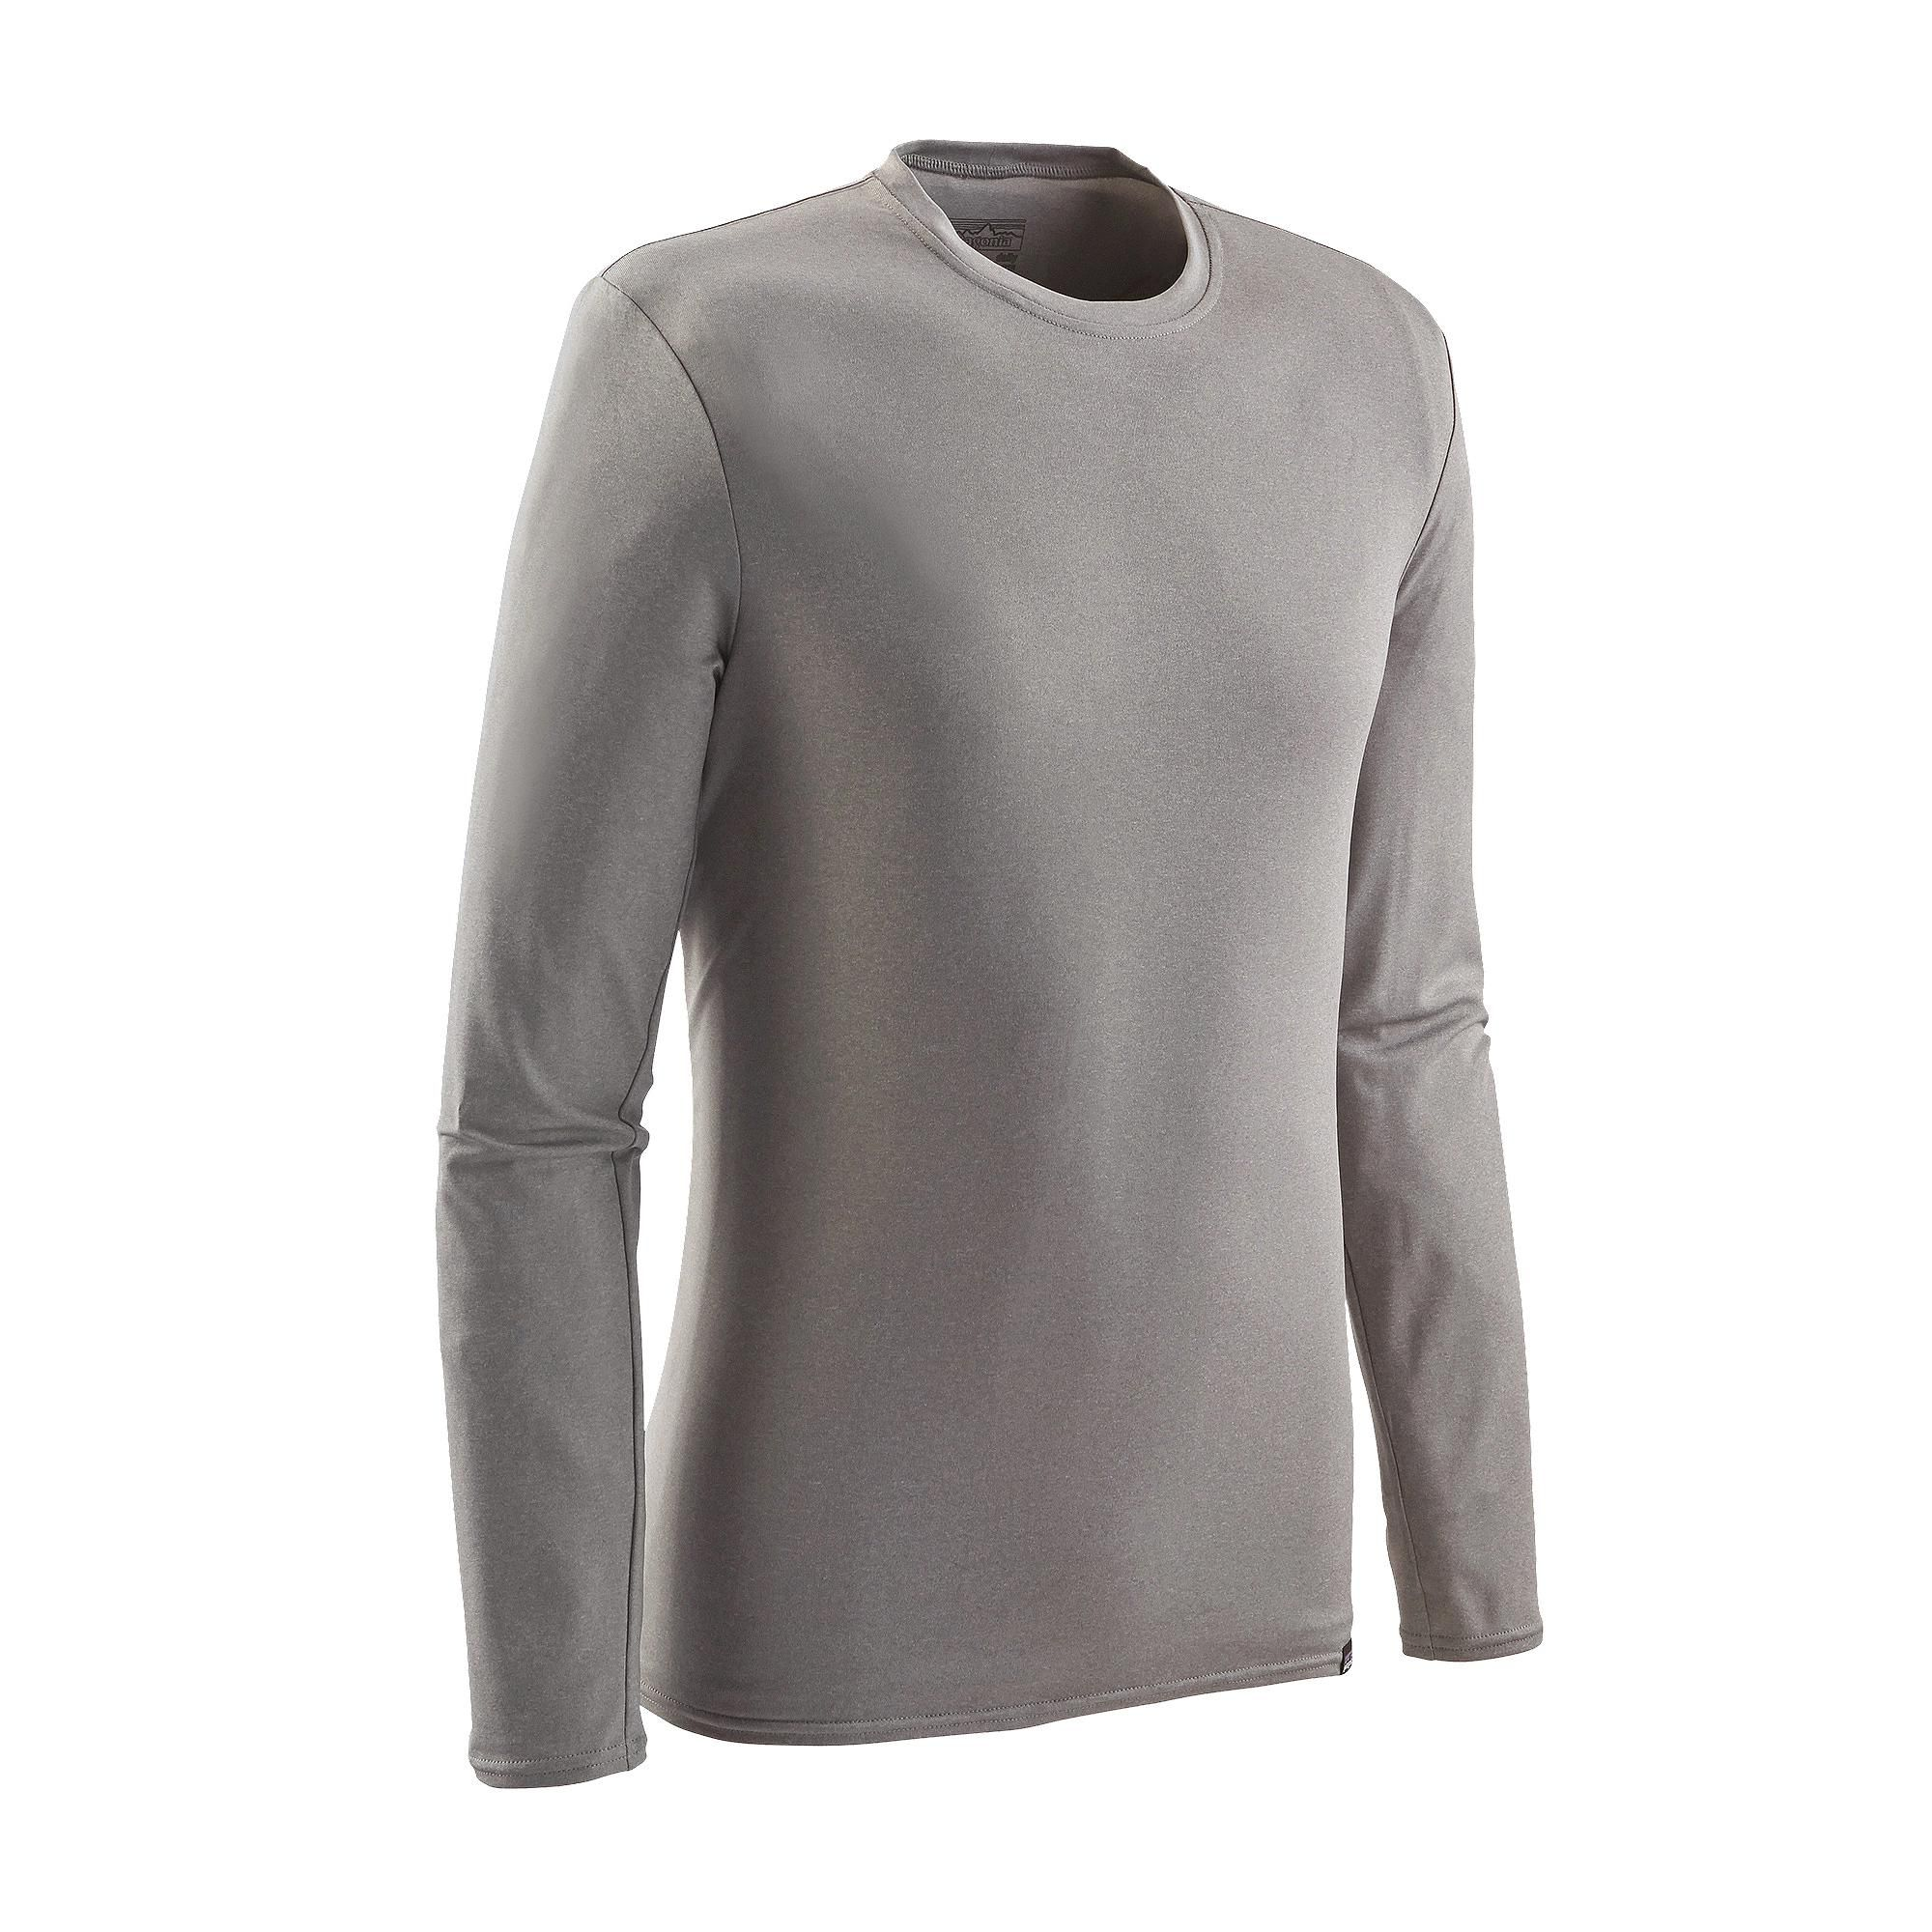 The Patagonia Men S Long Sleeved Capilene 174 Daily T Shirt